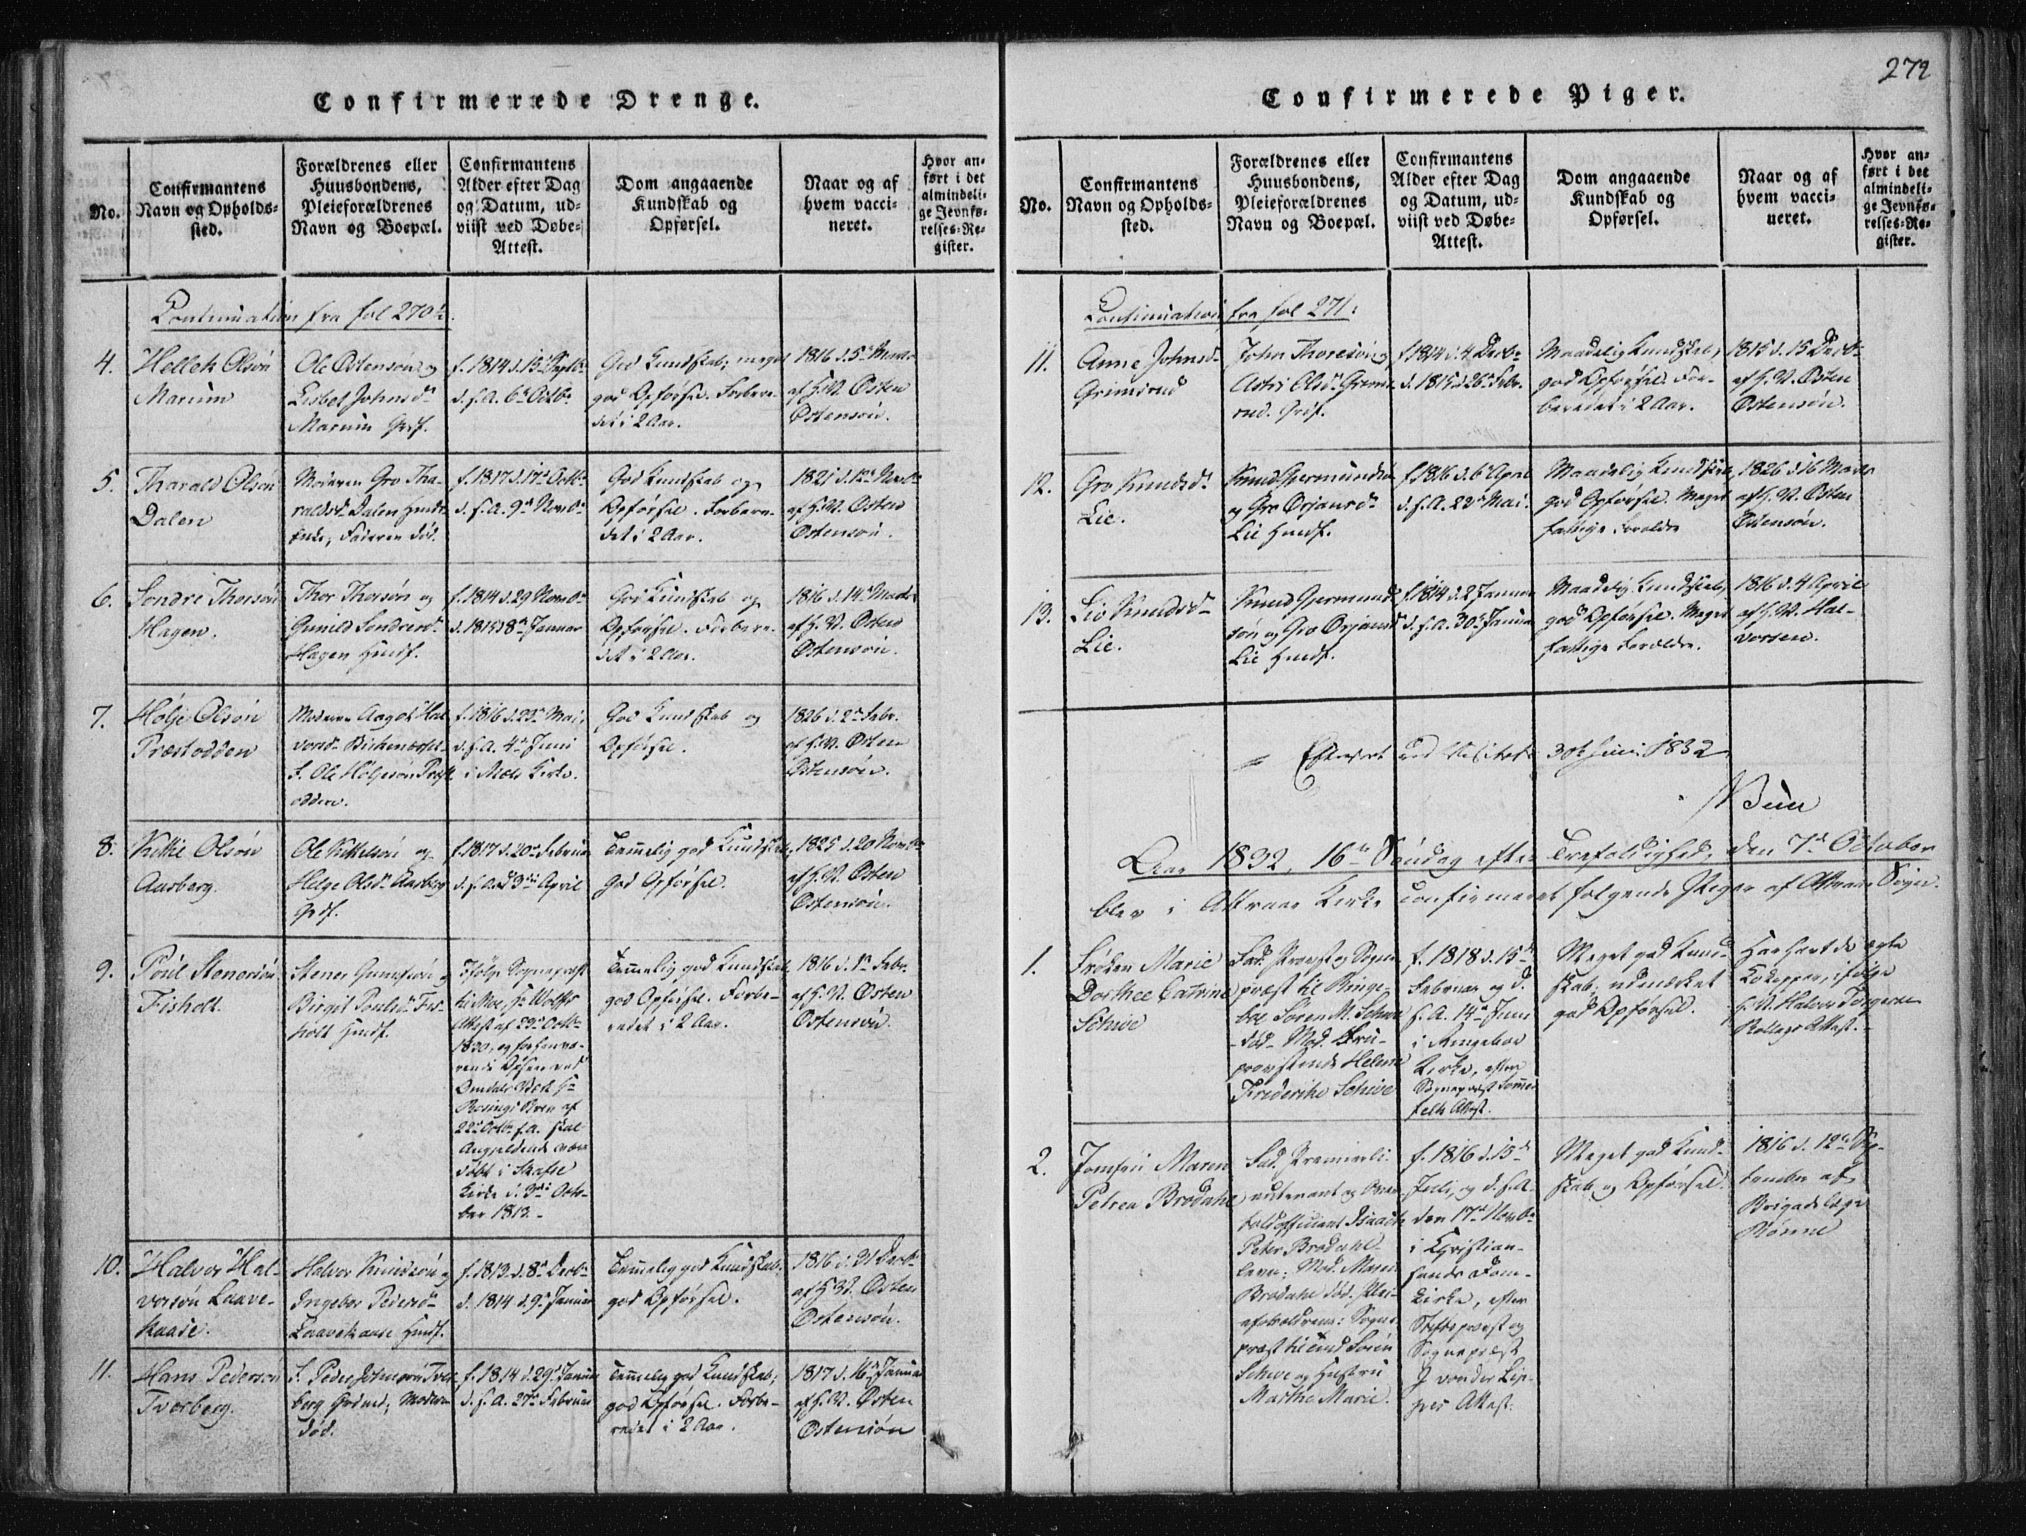 SAKO, Tinn kirkebøker, F/Fa/L0004: Ministerialbok nr. I 4, 1815-1843, s. 272